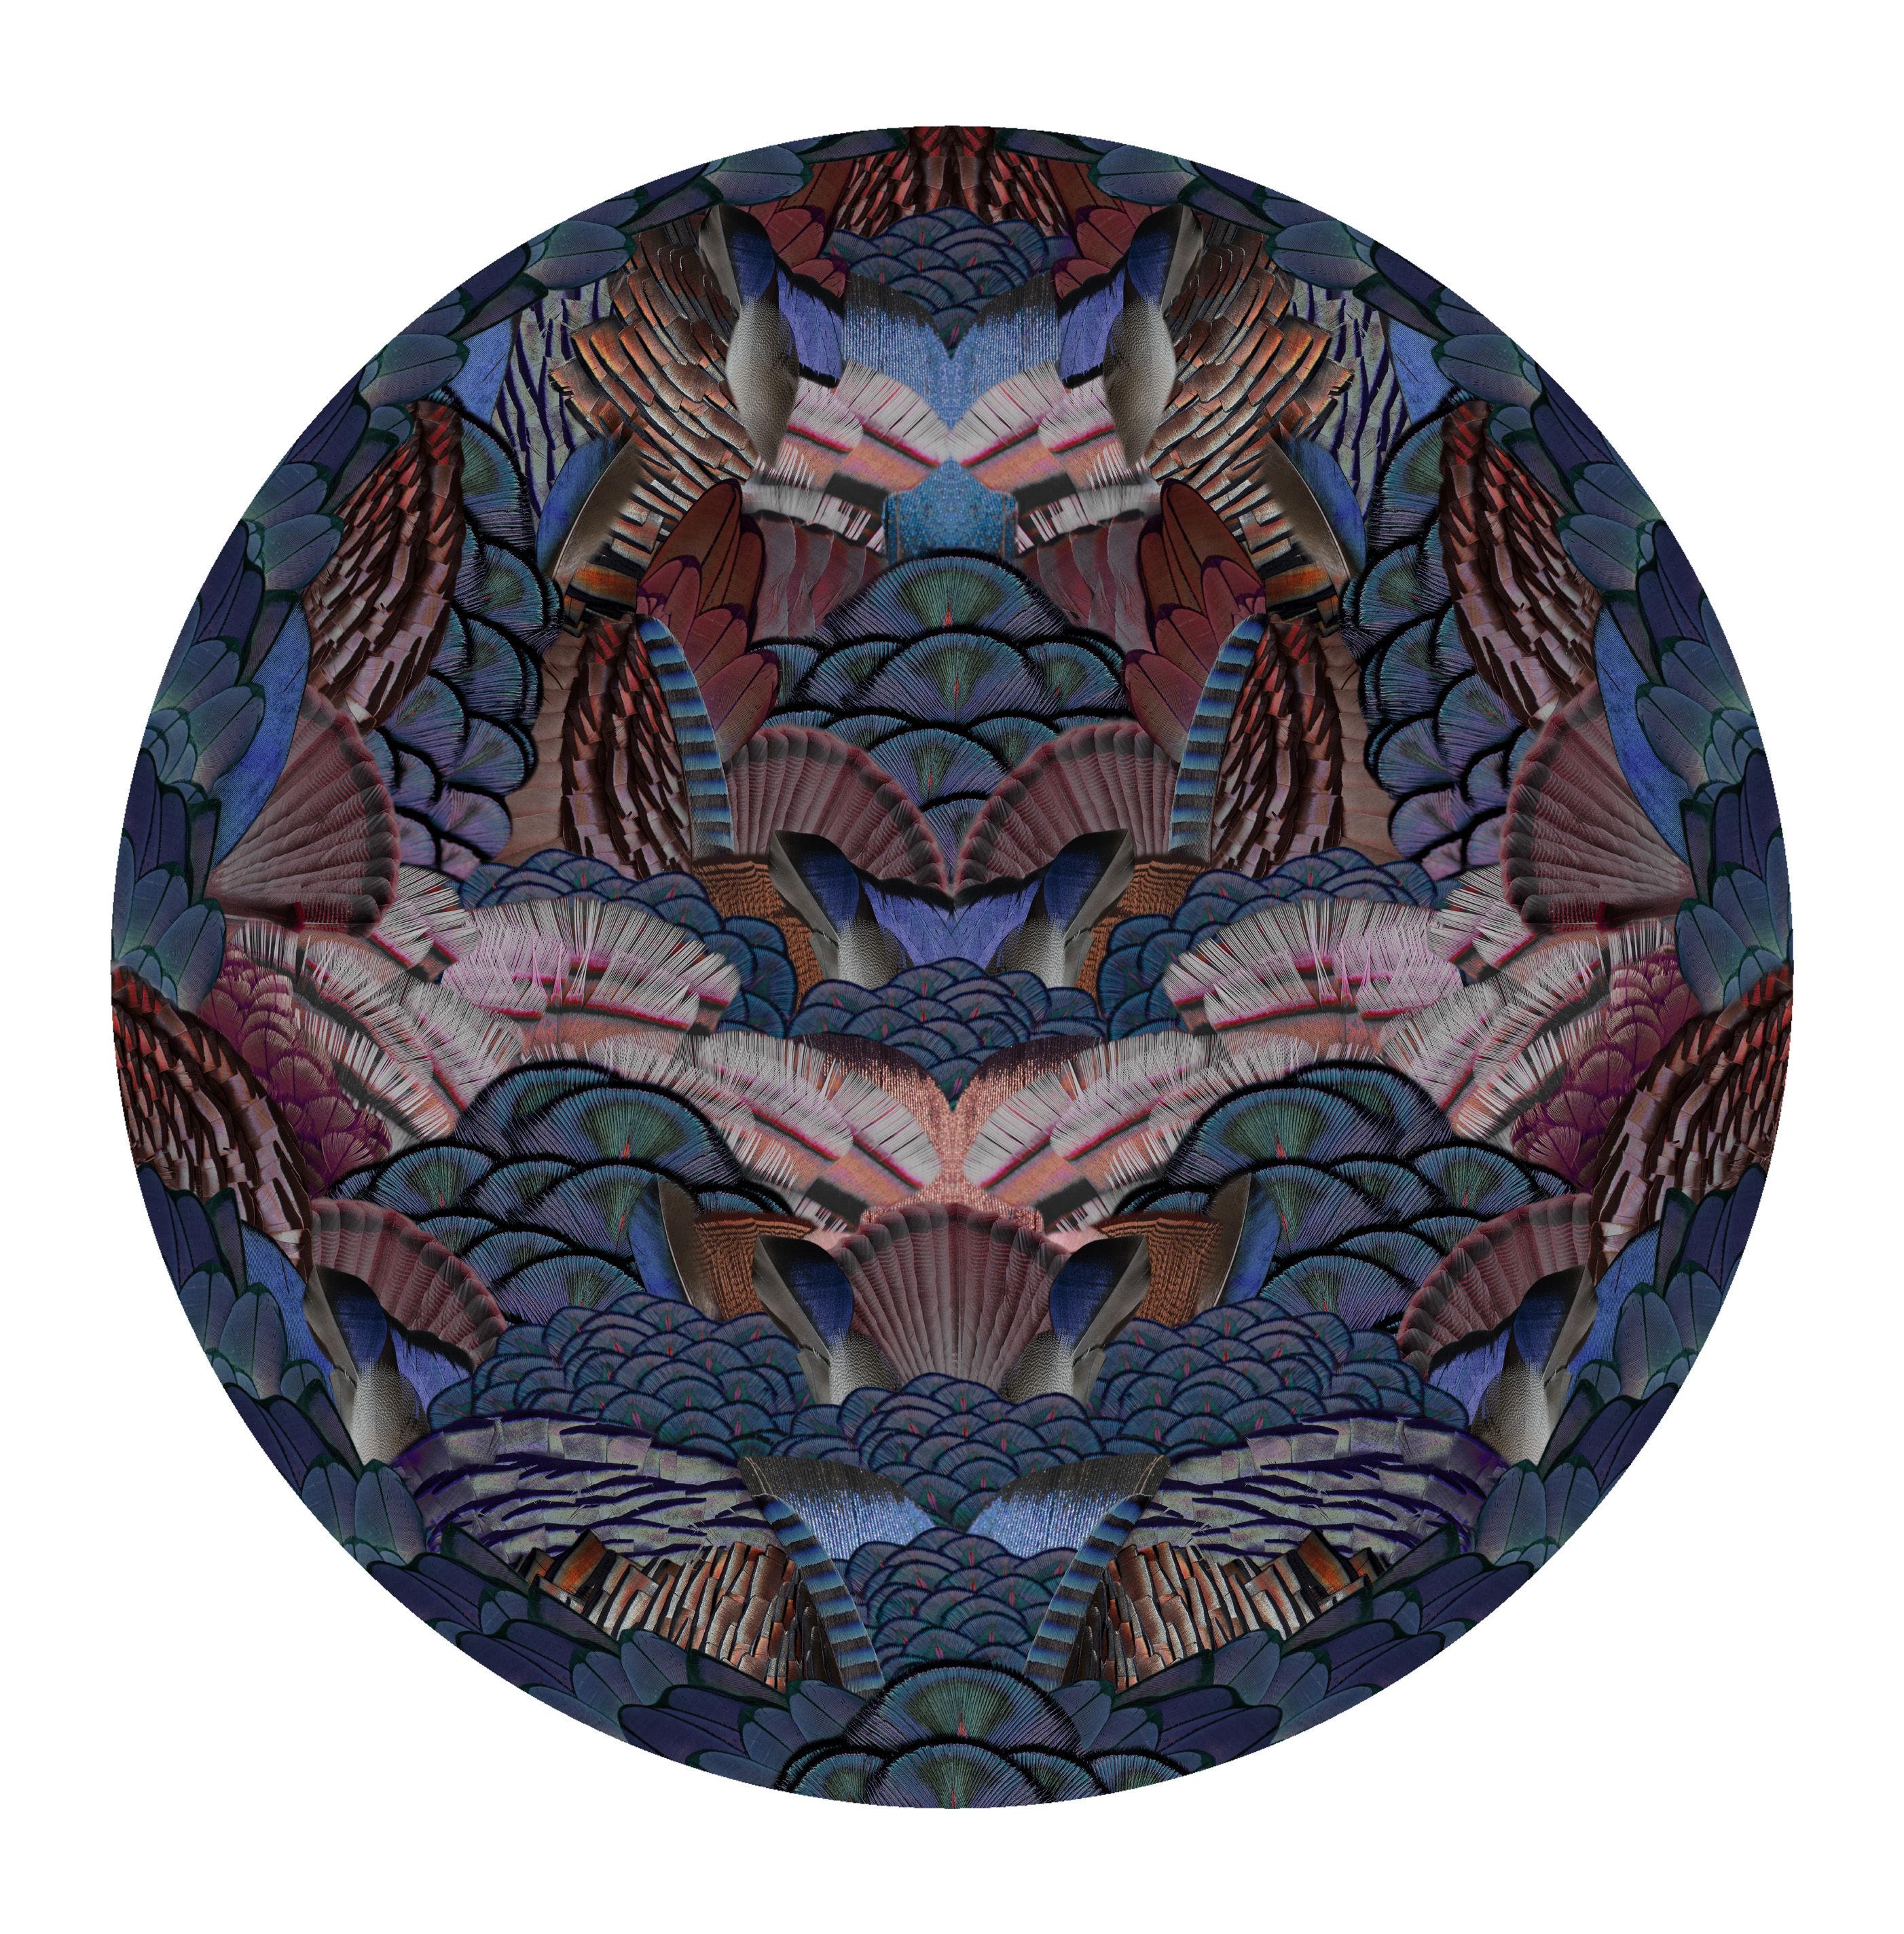 Déco - Tapis - Tapis Calligraphy Bird / Ø 250 cm - Moooi Carpets - Multicolore - Polyamide